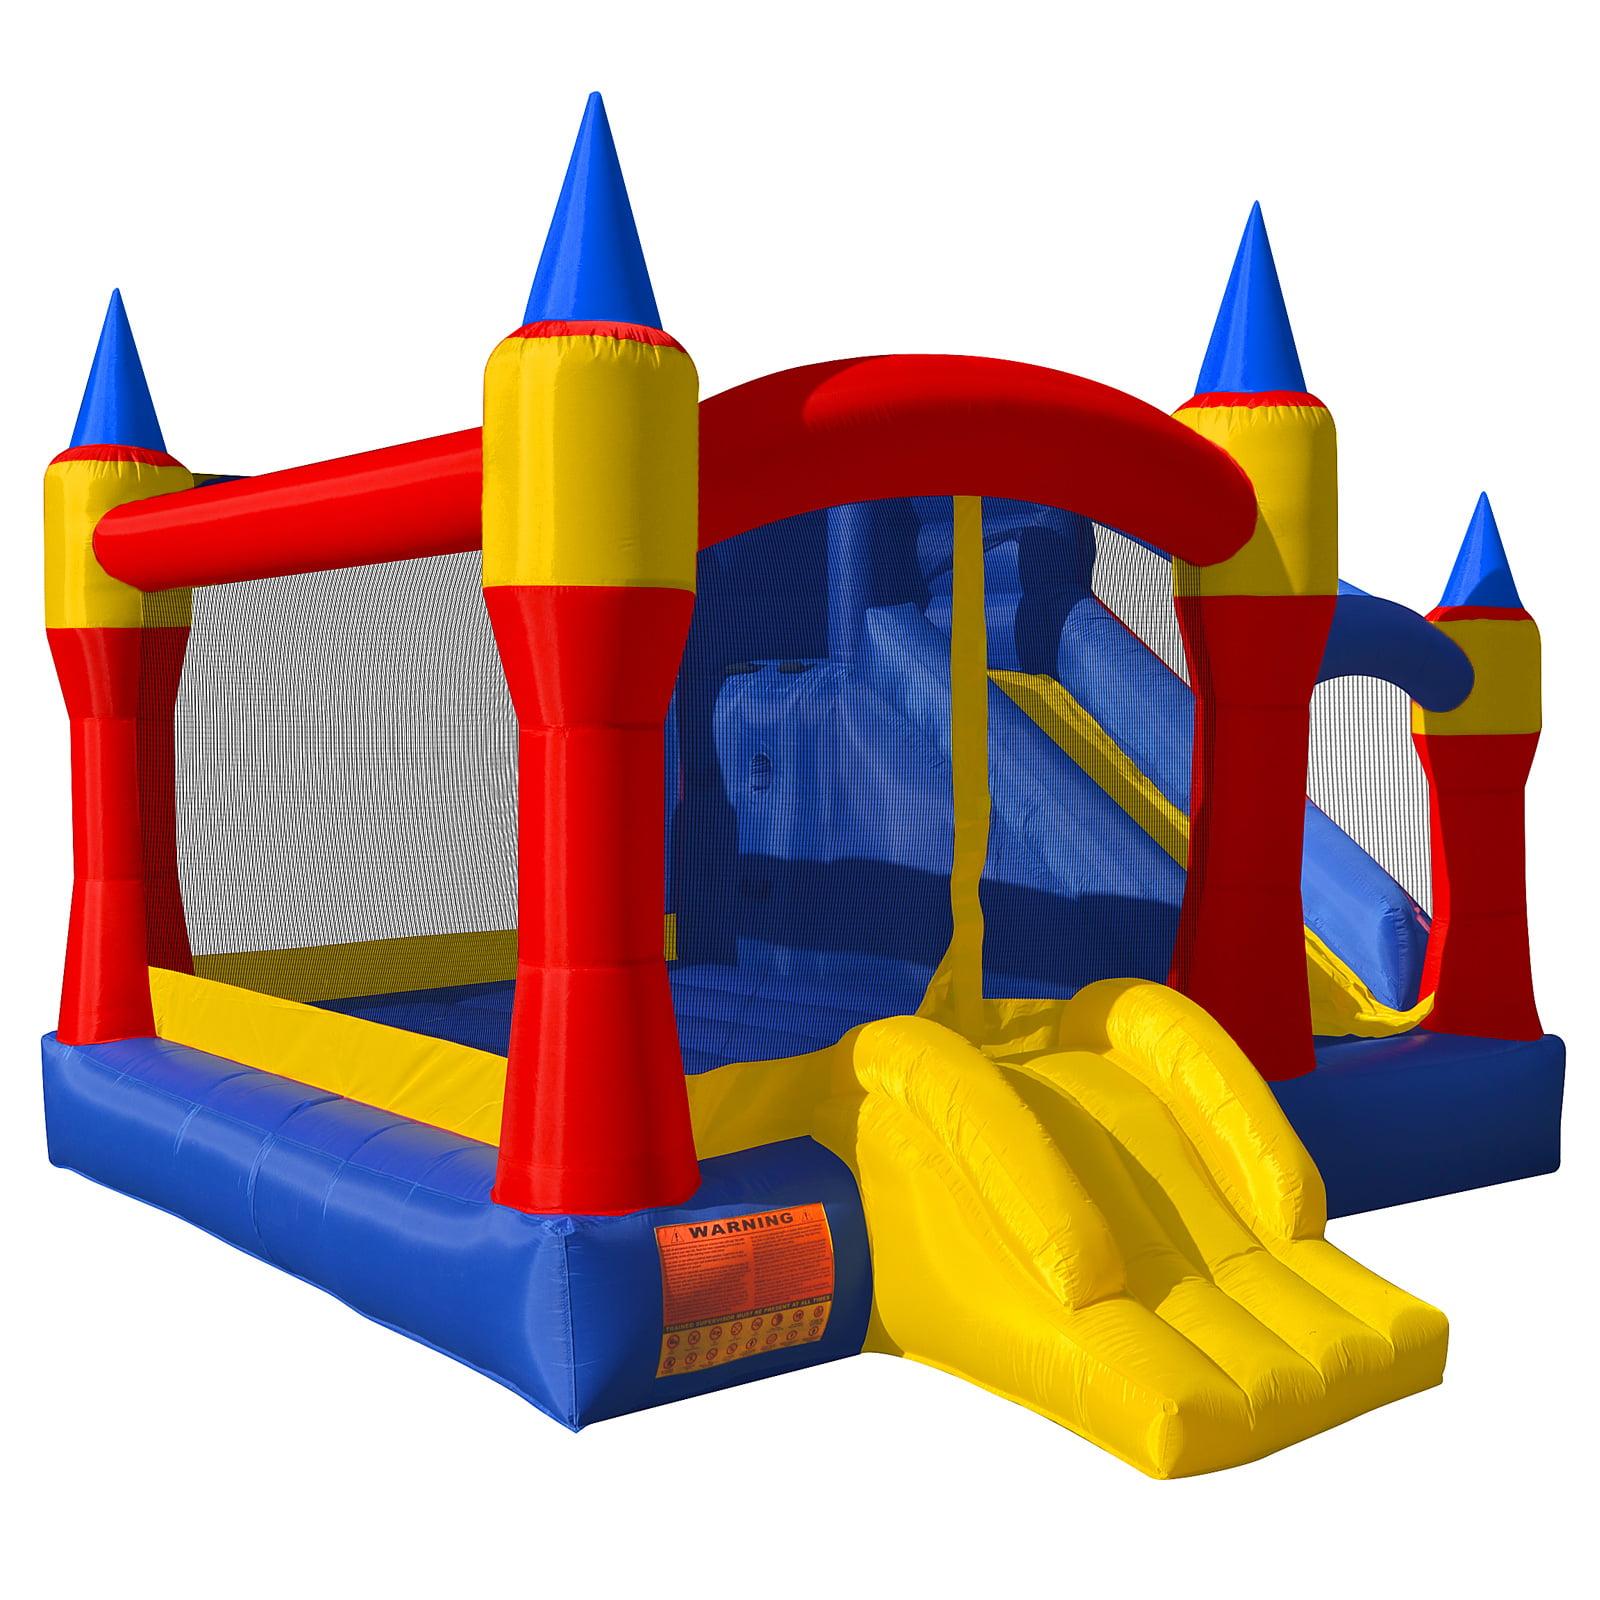 Cloud 9 Royal Slide Bounce House Inflatable Bouncing Jumper